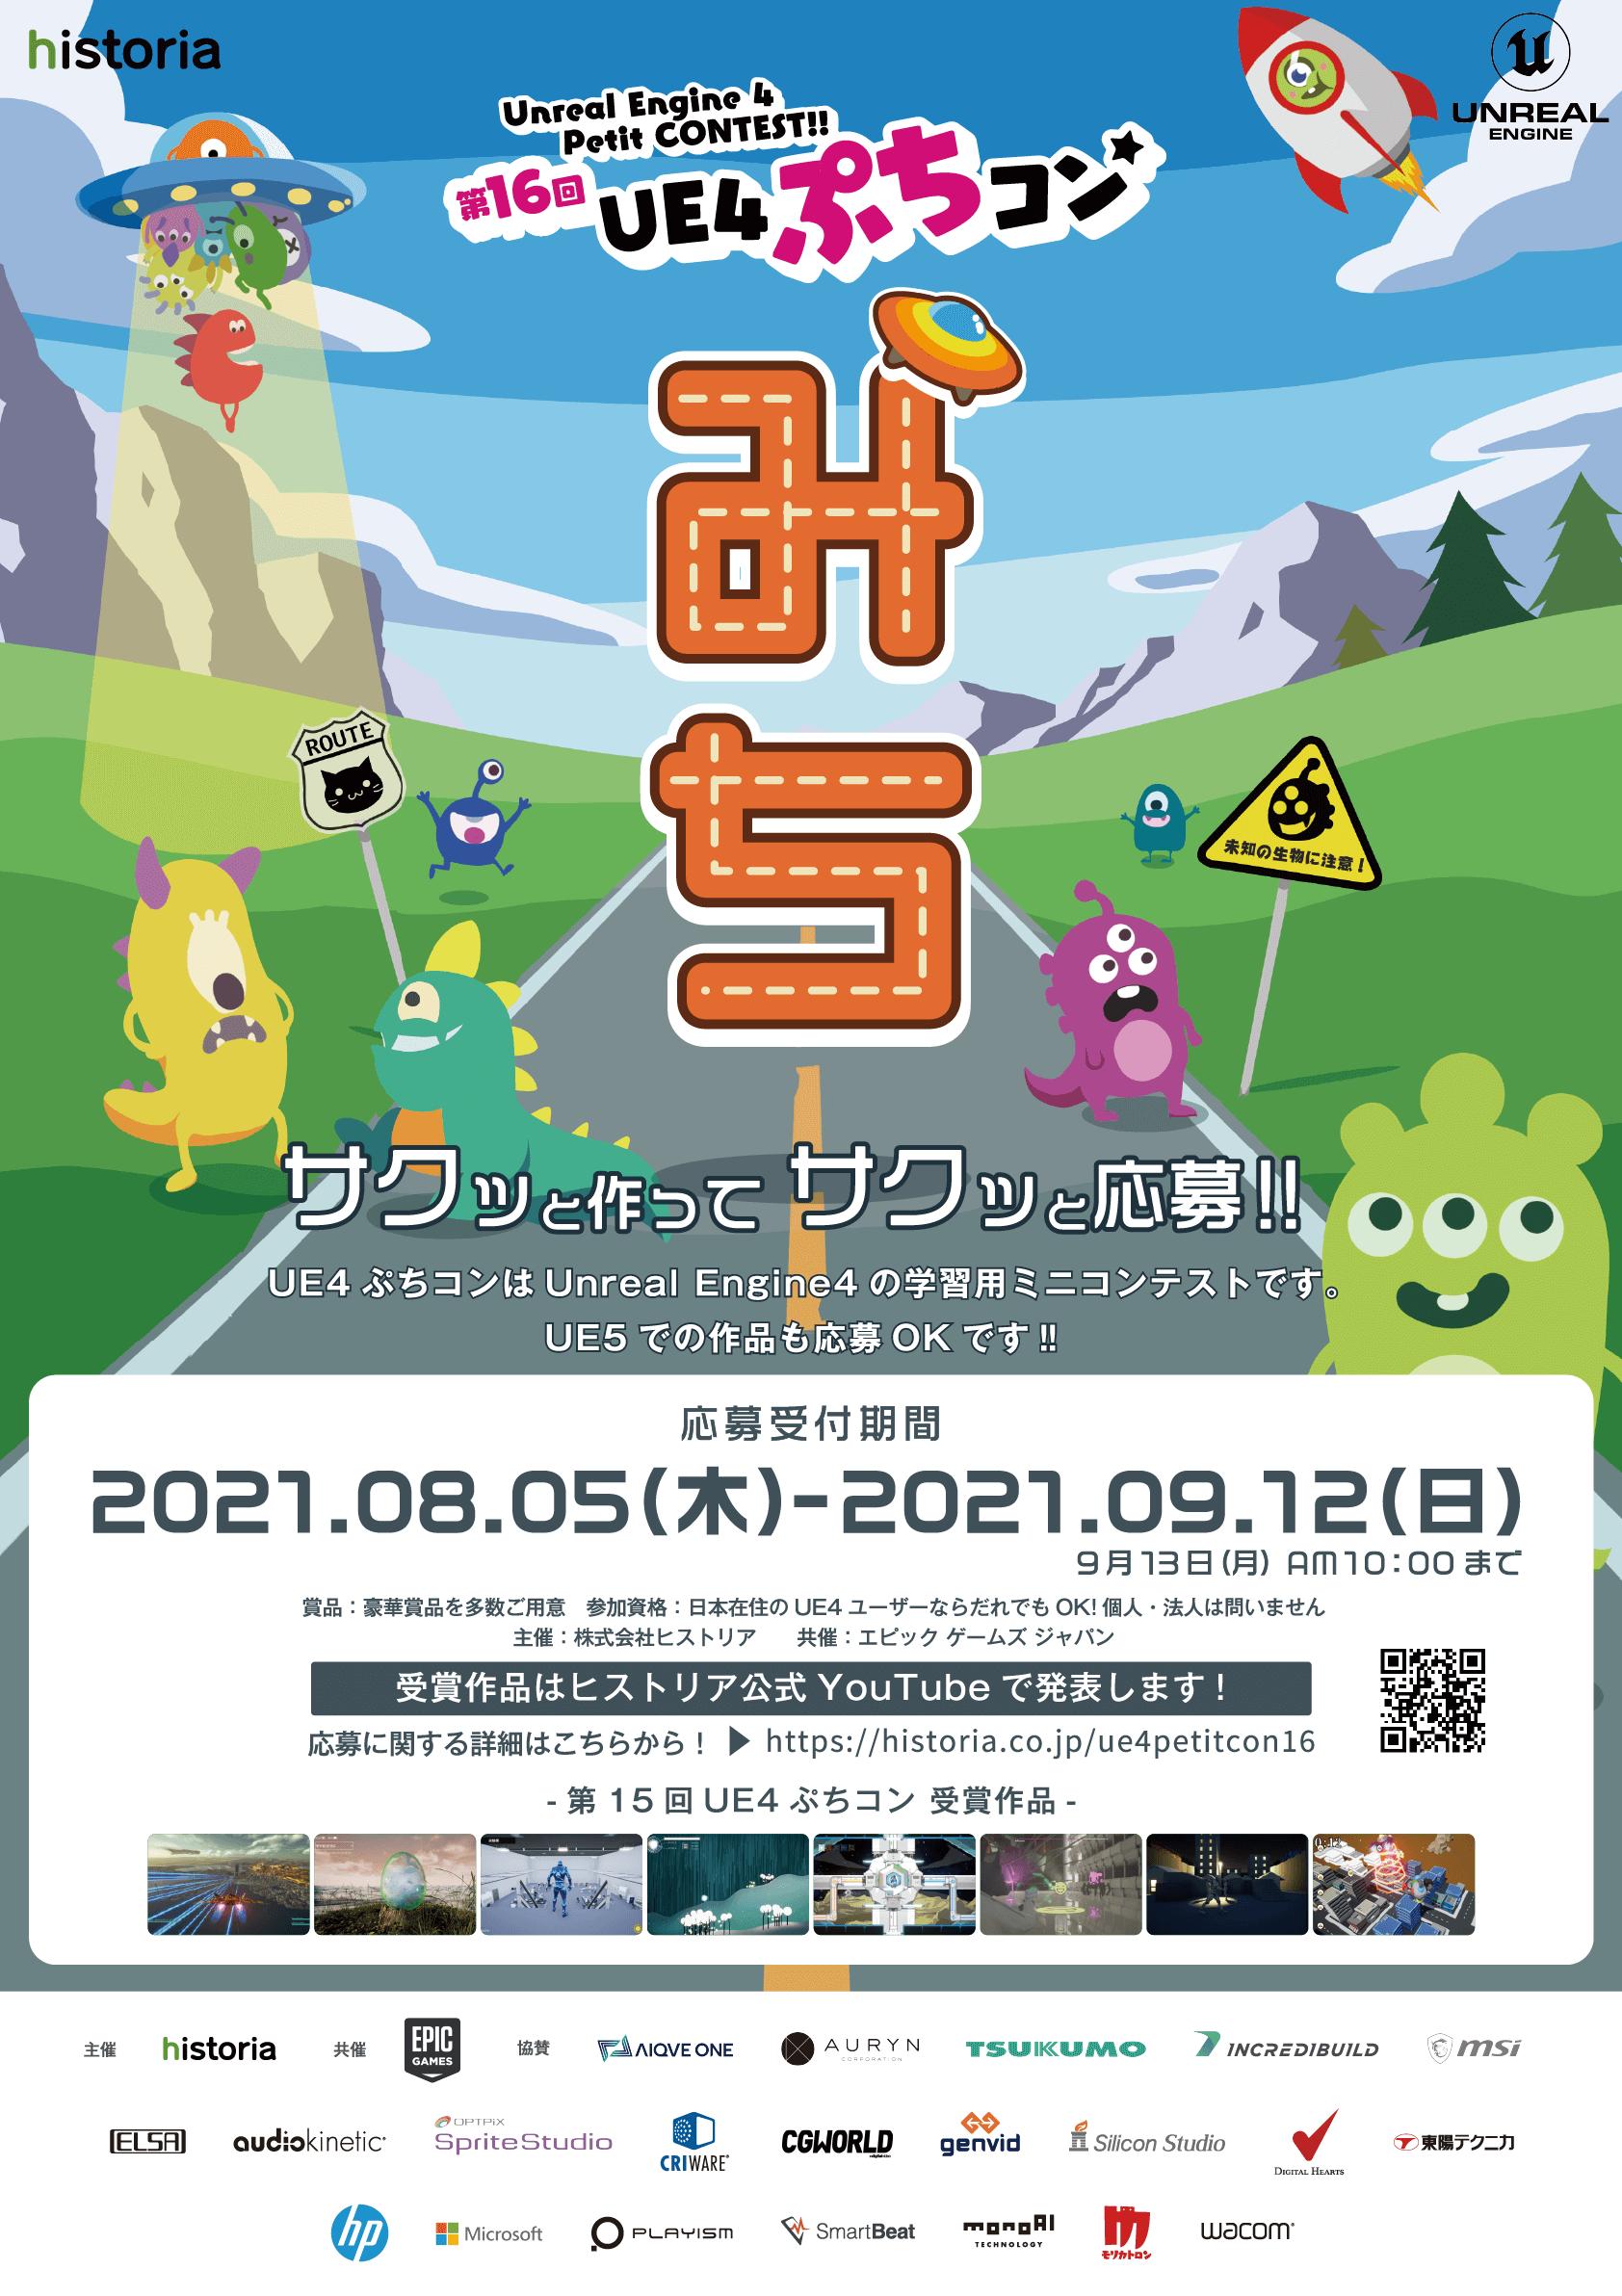 Ue4petitcon16th Poster